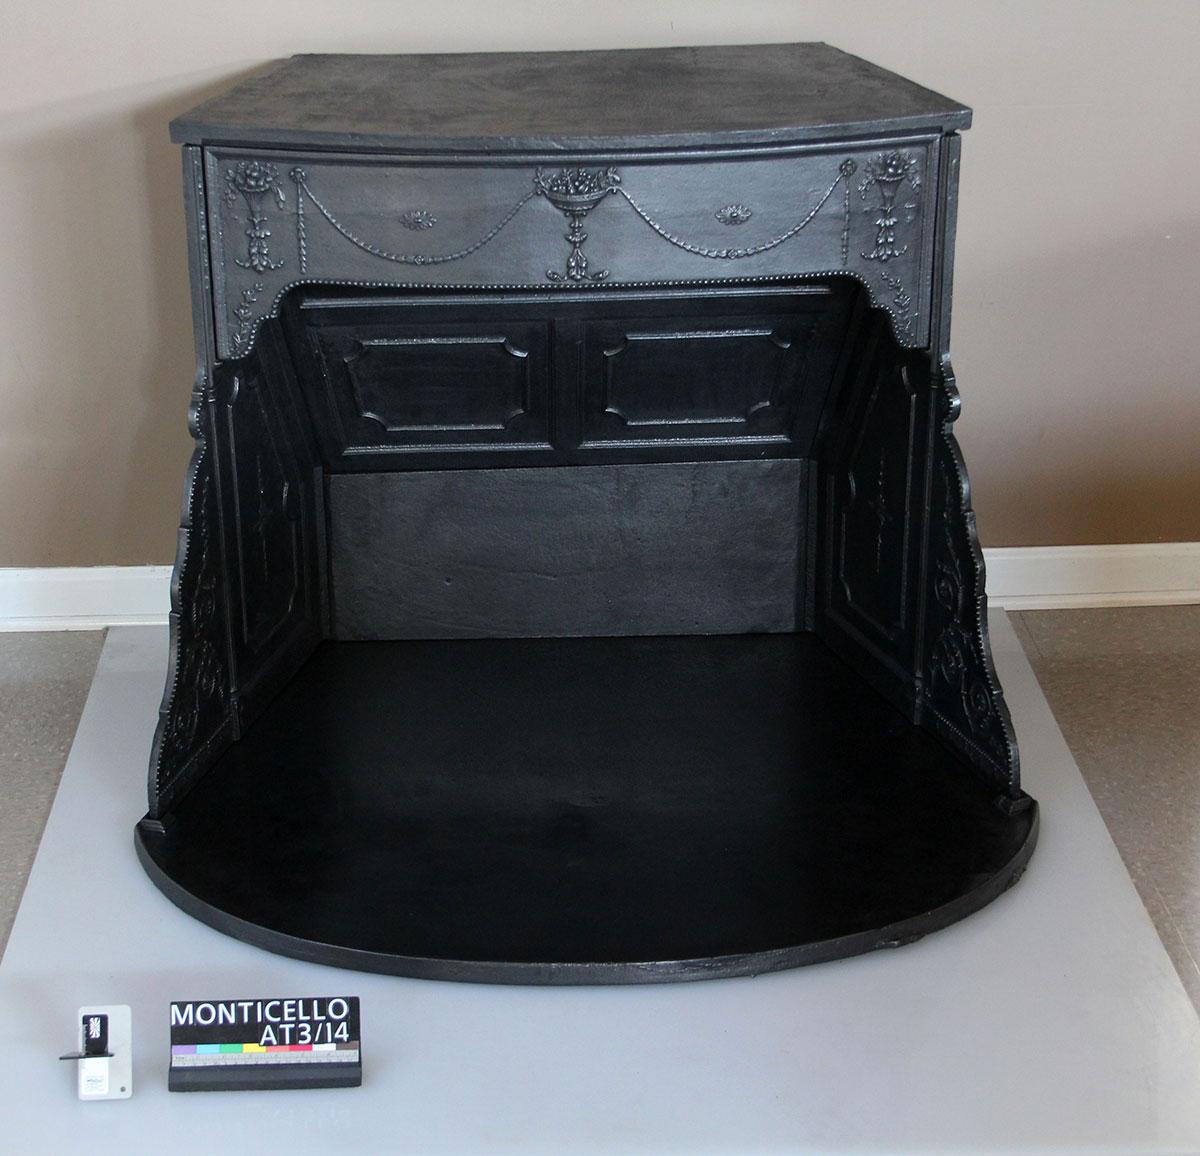 Monticello-stove-conservation-10.jpg